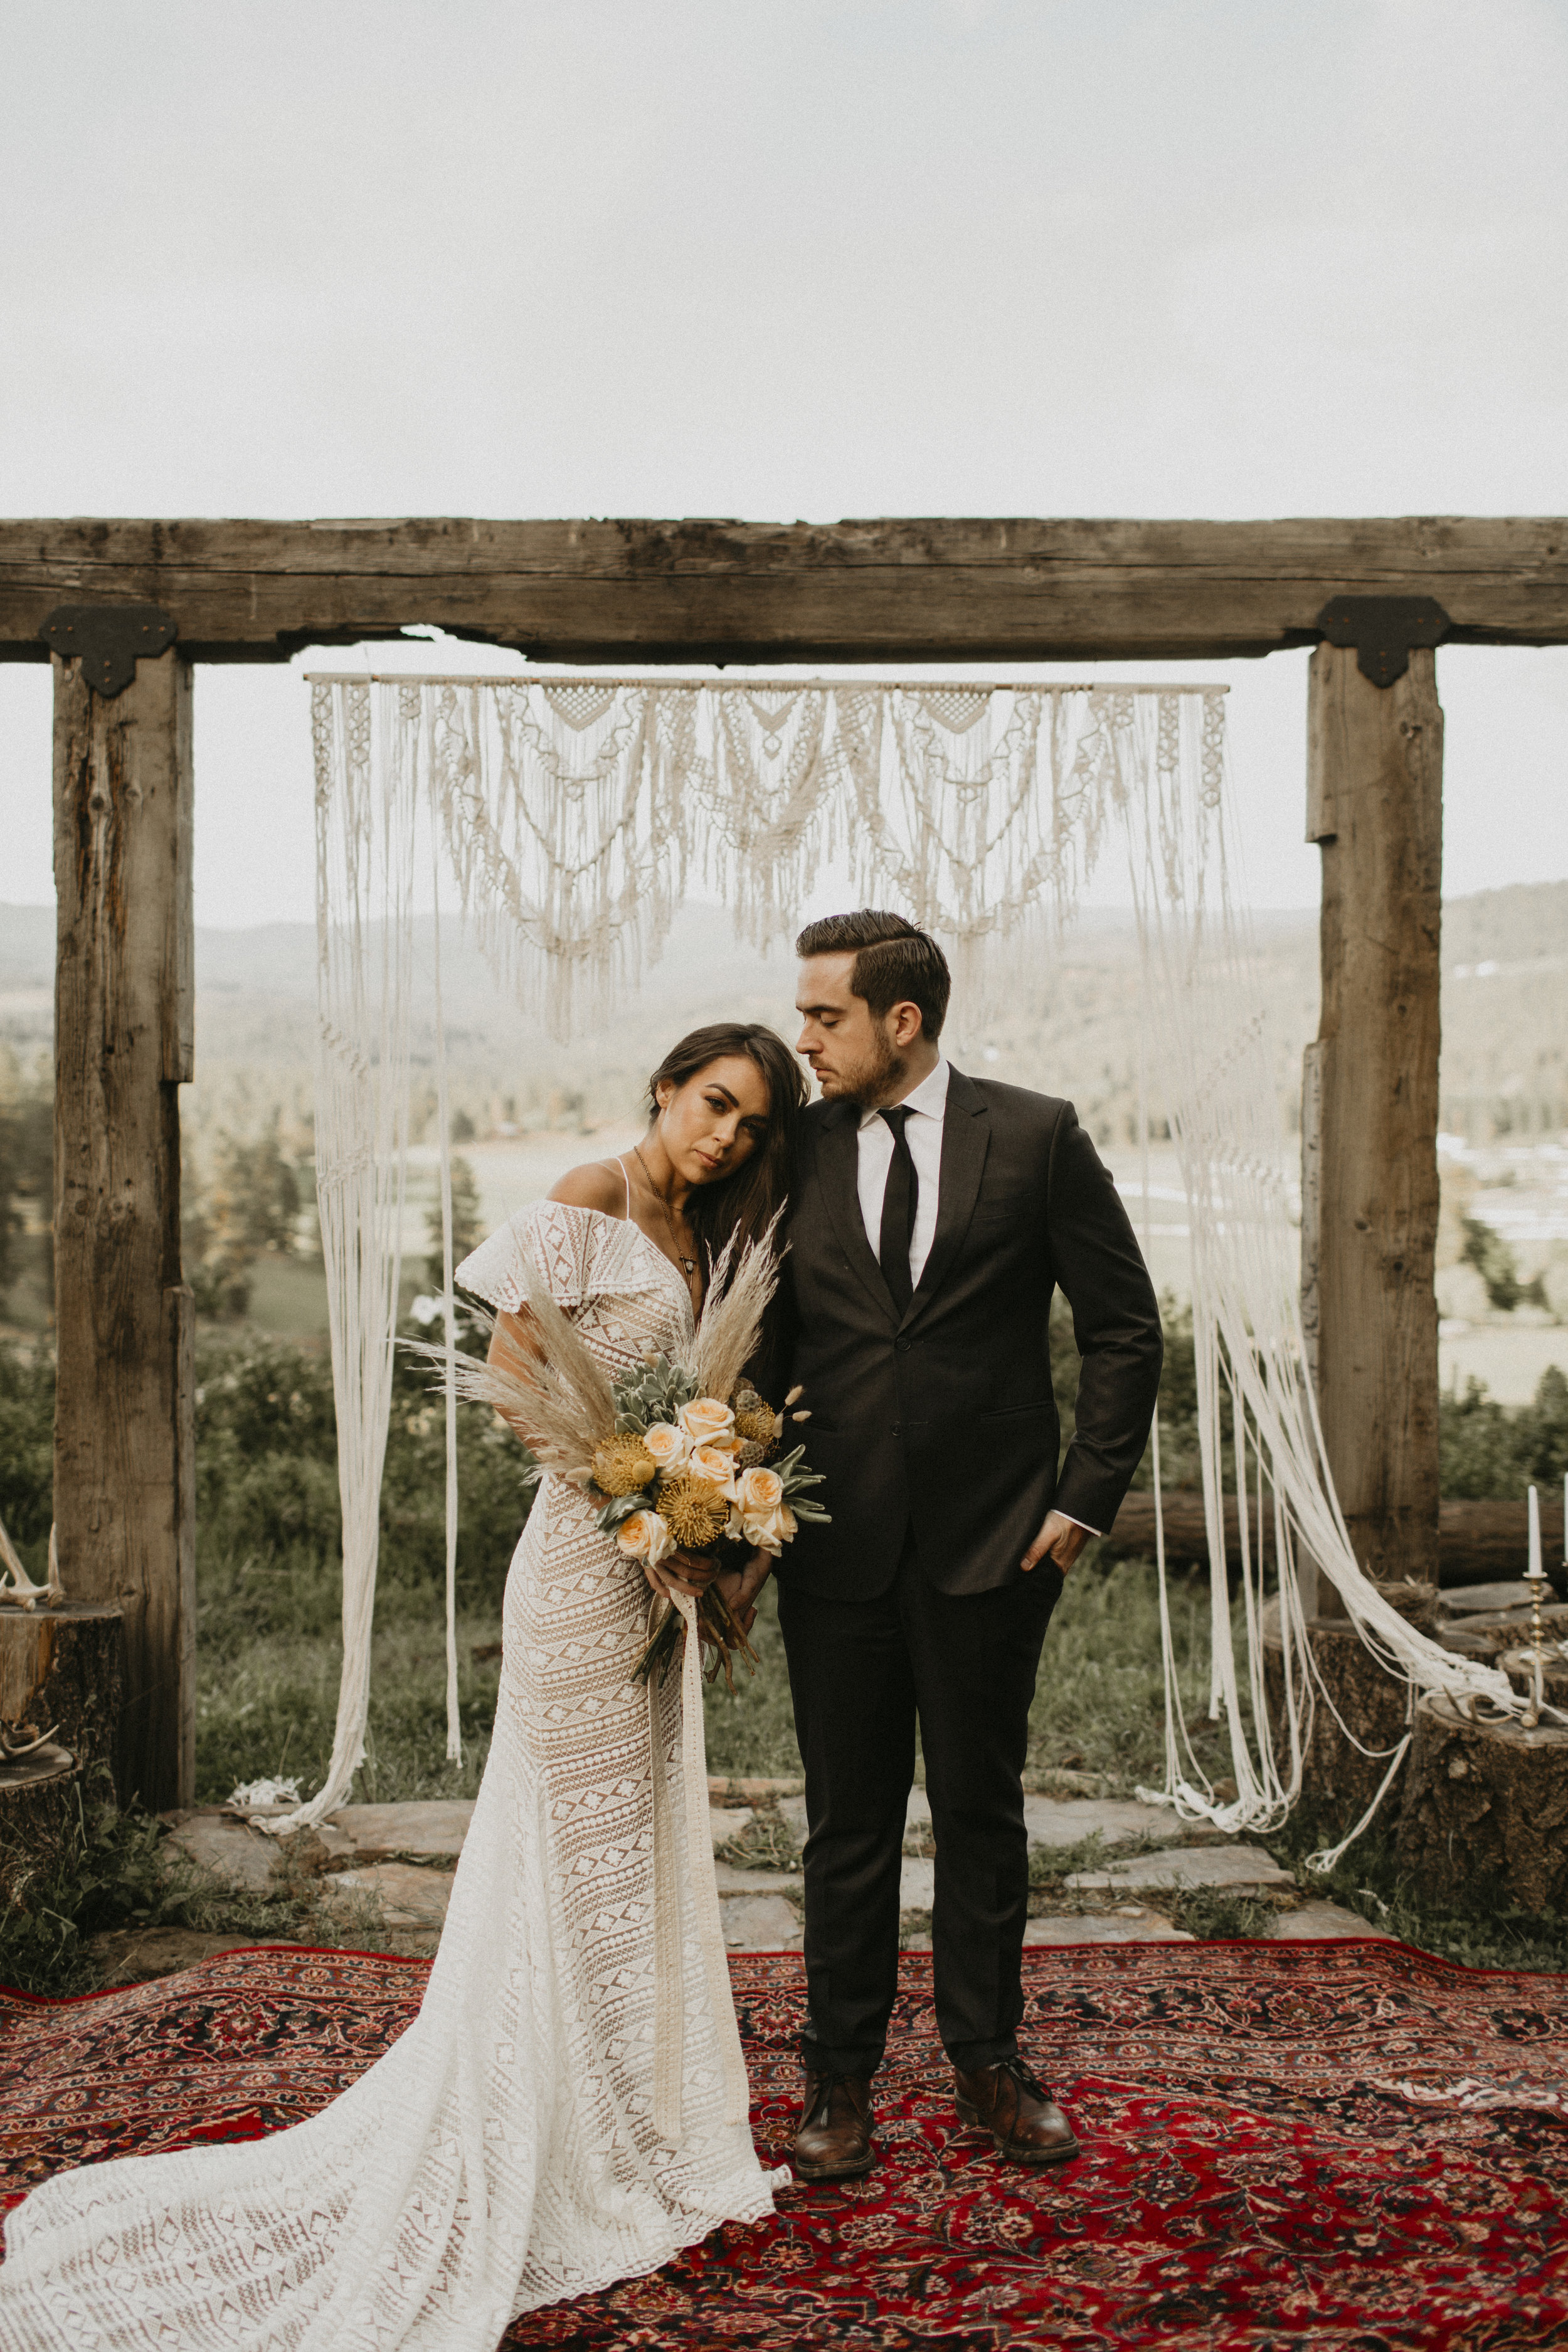 Spokane boho cattle wedding bridal bouquet Persian rug woods rustic ceremony